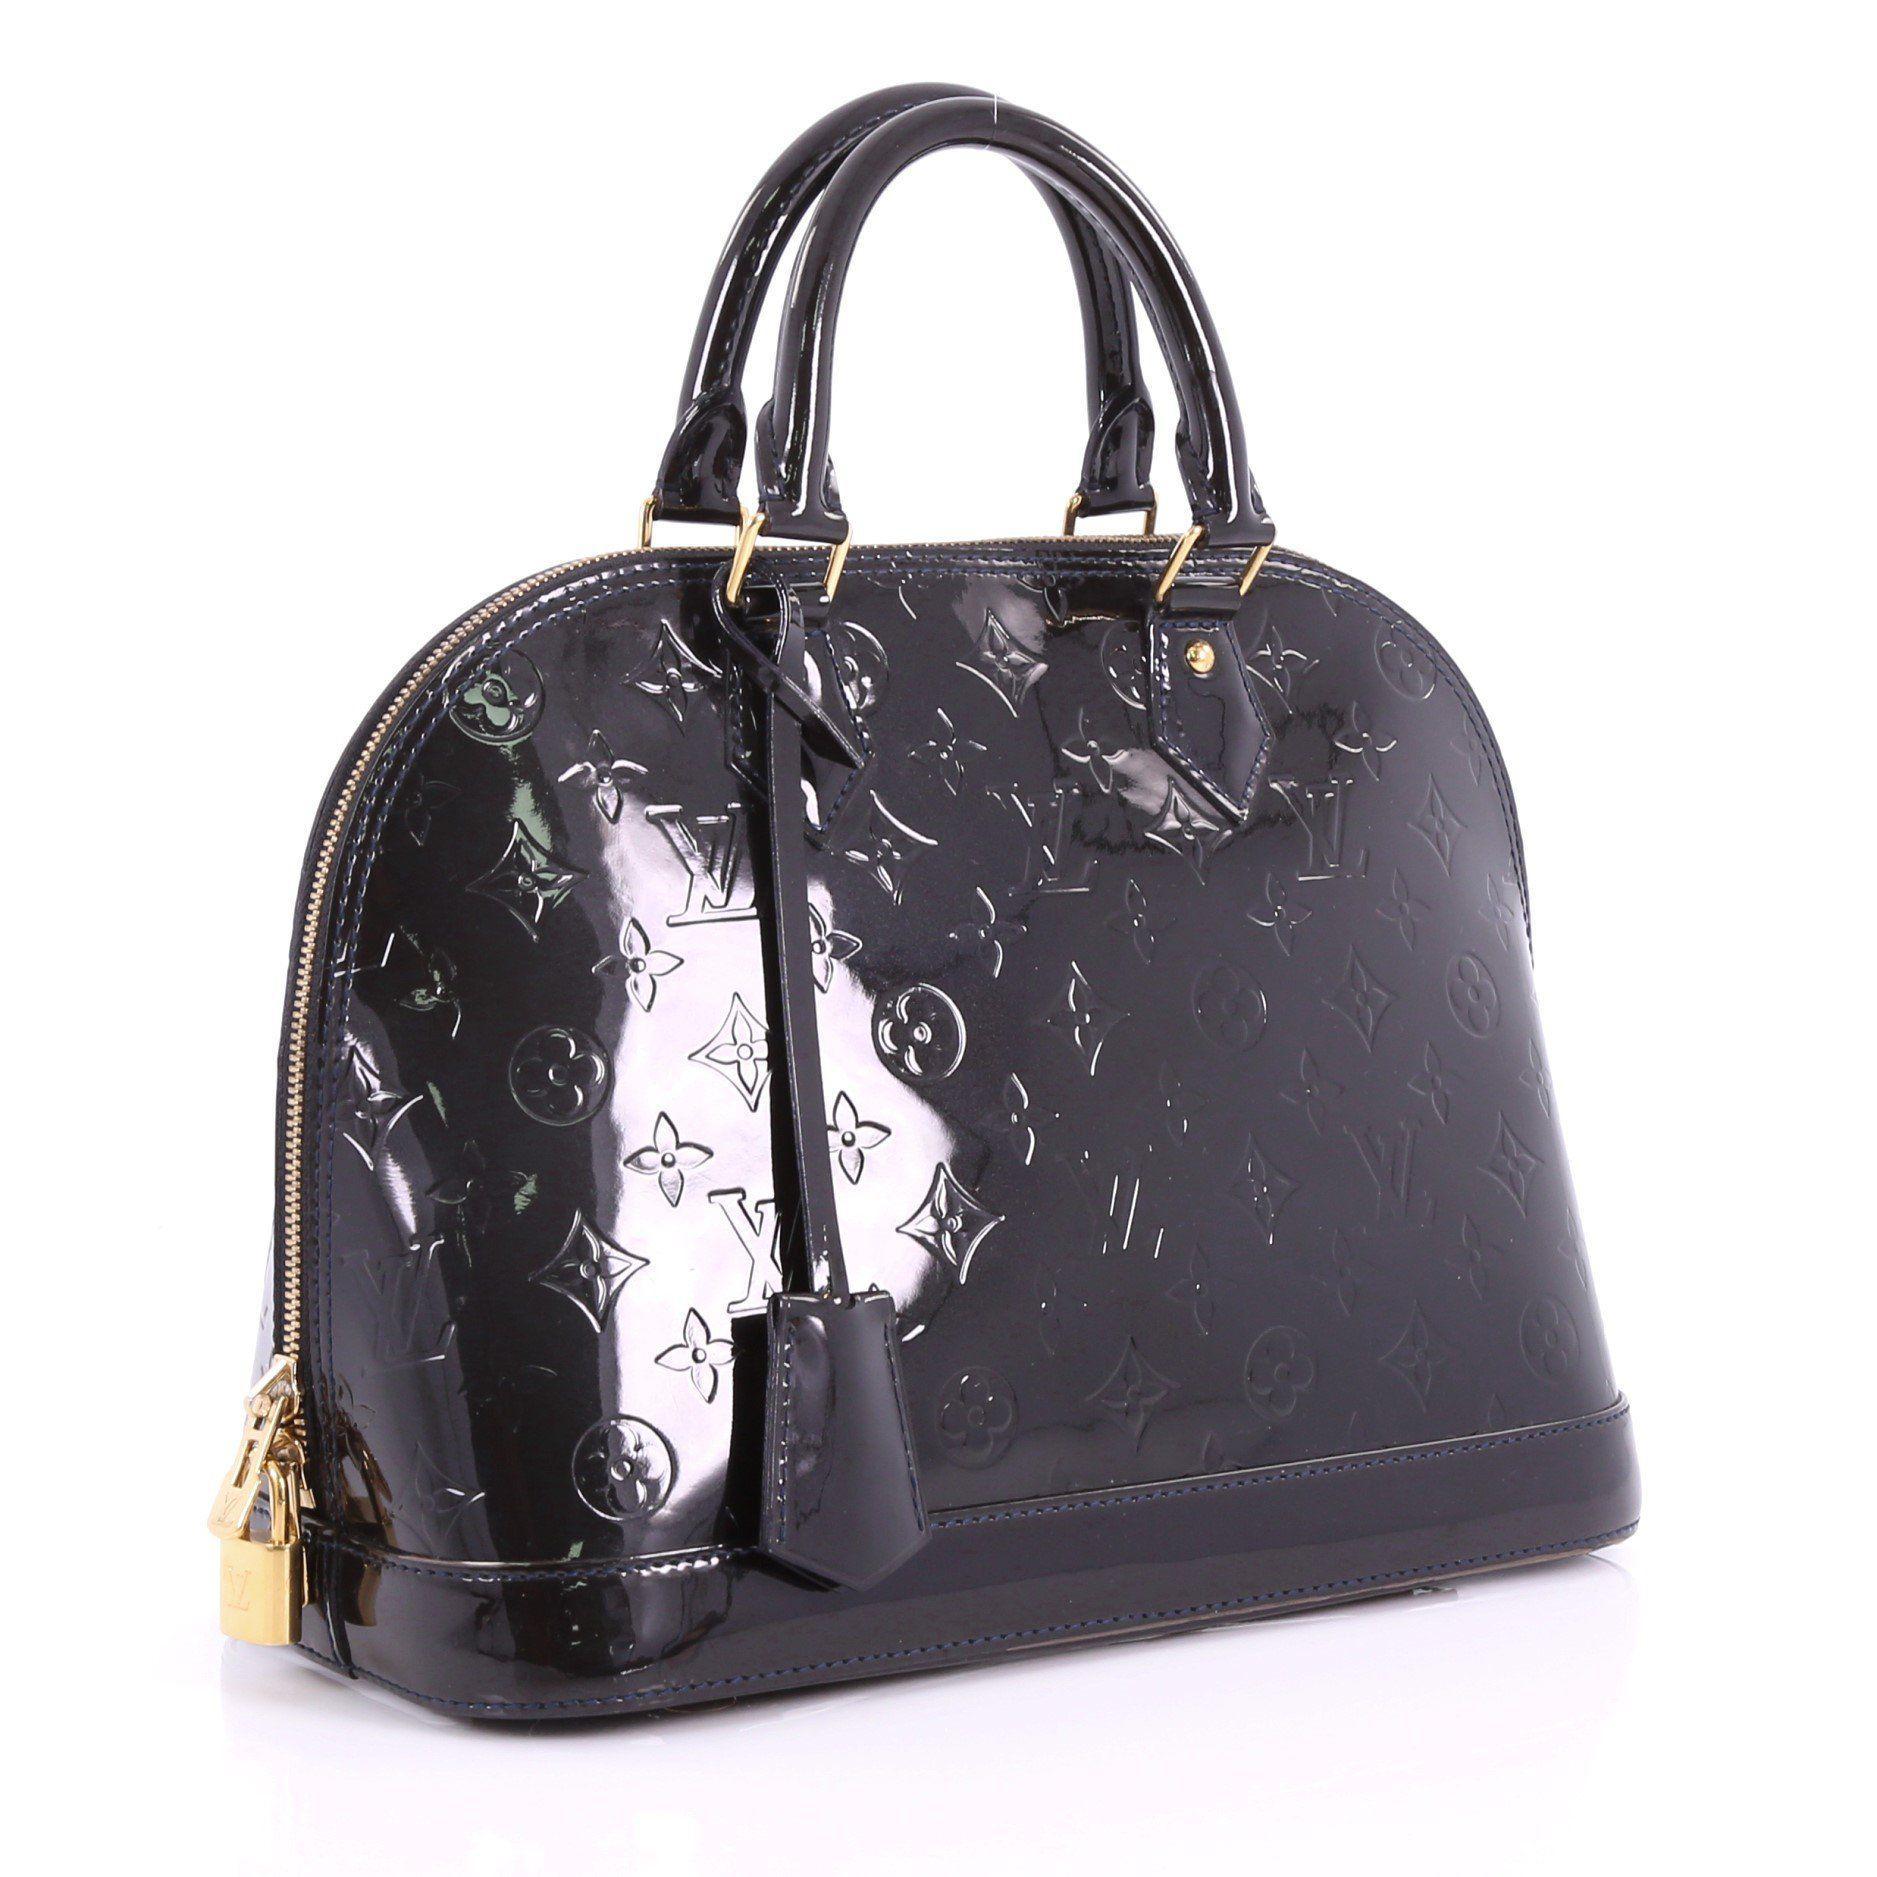 dc302576f6a7 Louis Vuitton - Black Pre Owned Alma Handbag Monogram Vernis Pm - Lyst.  View fullscreen